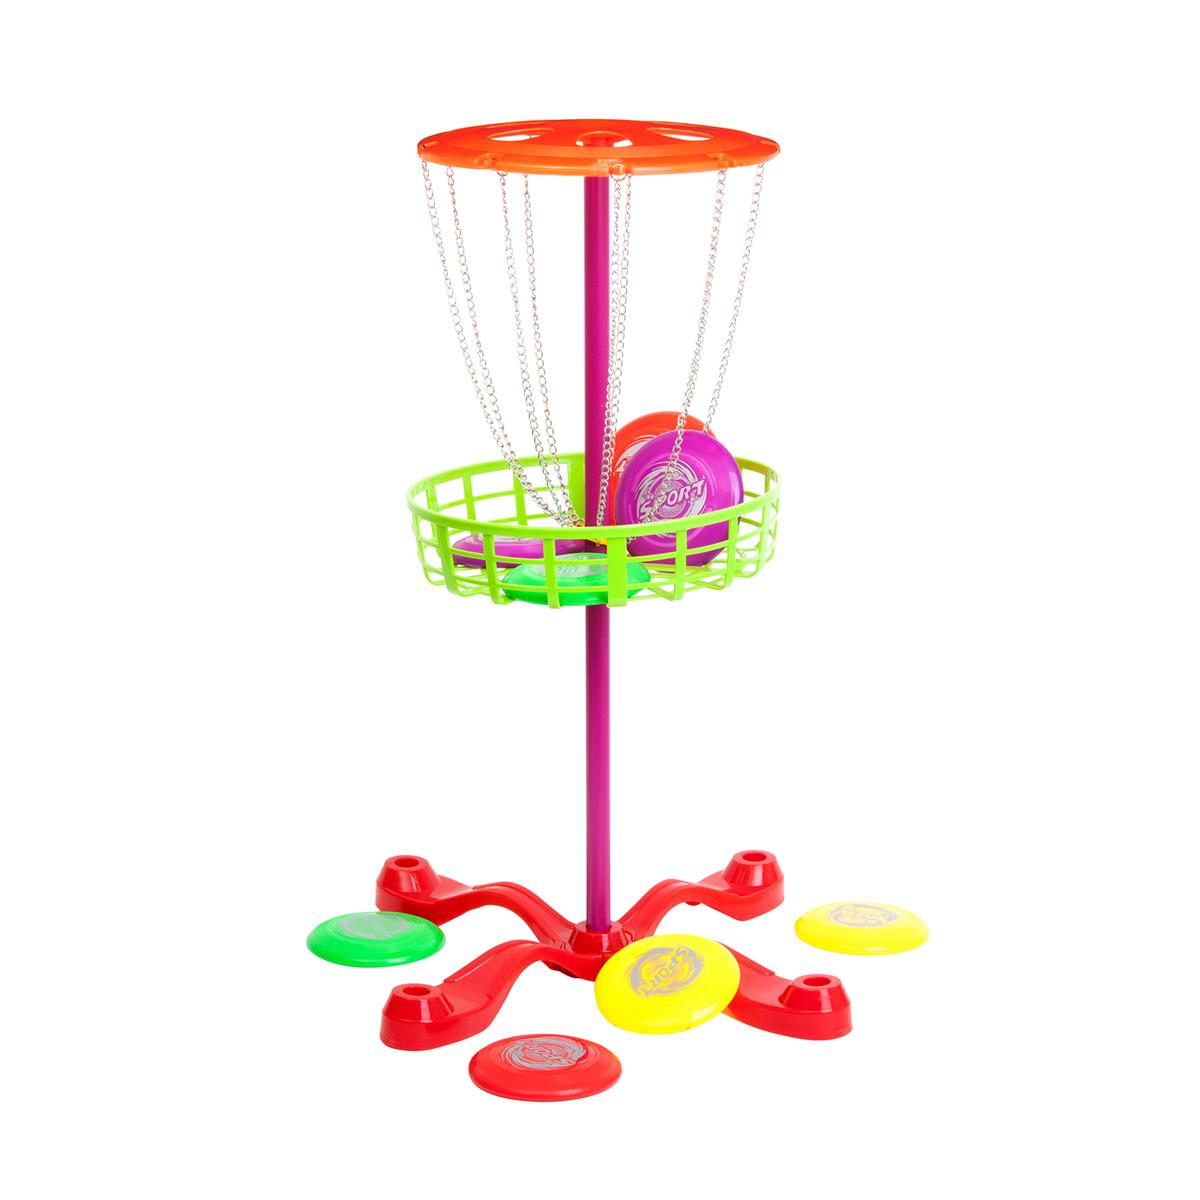 Kids Sports Freesbee med nätkorg